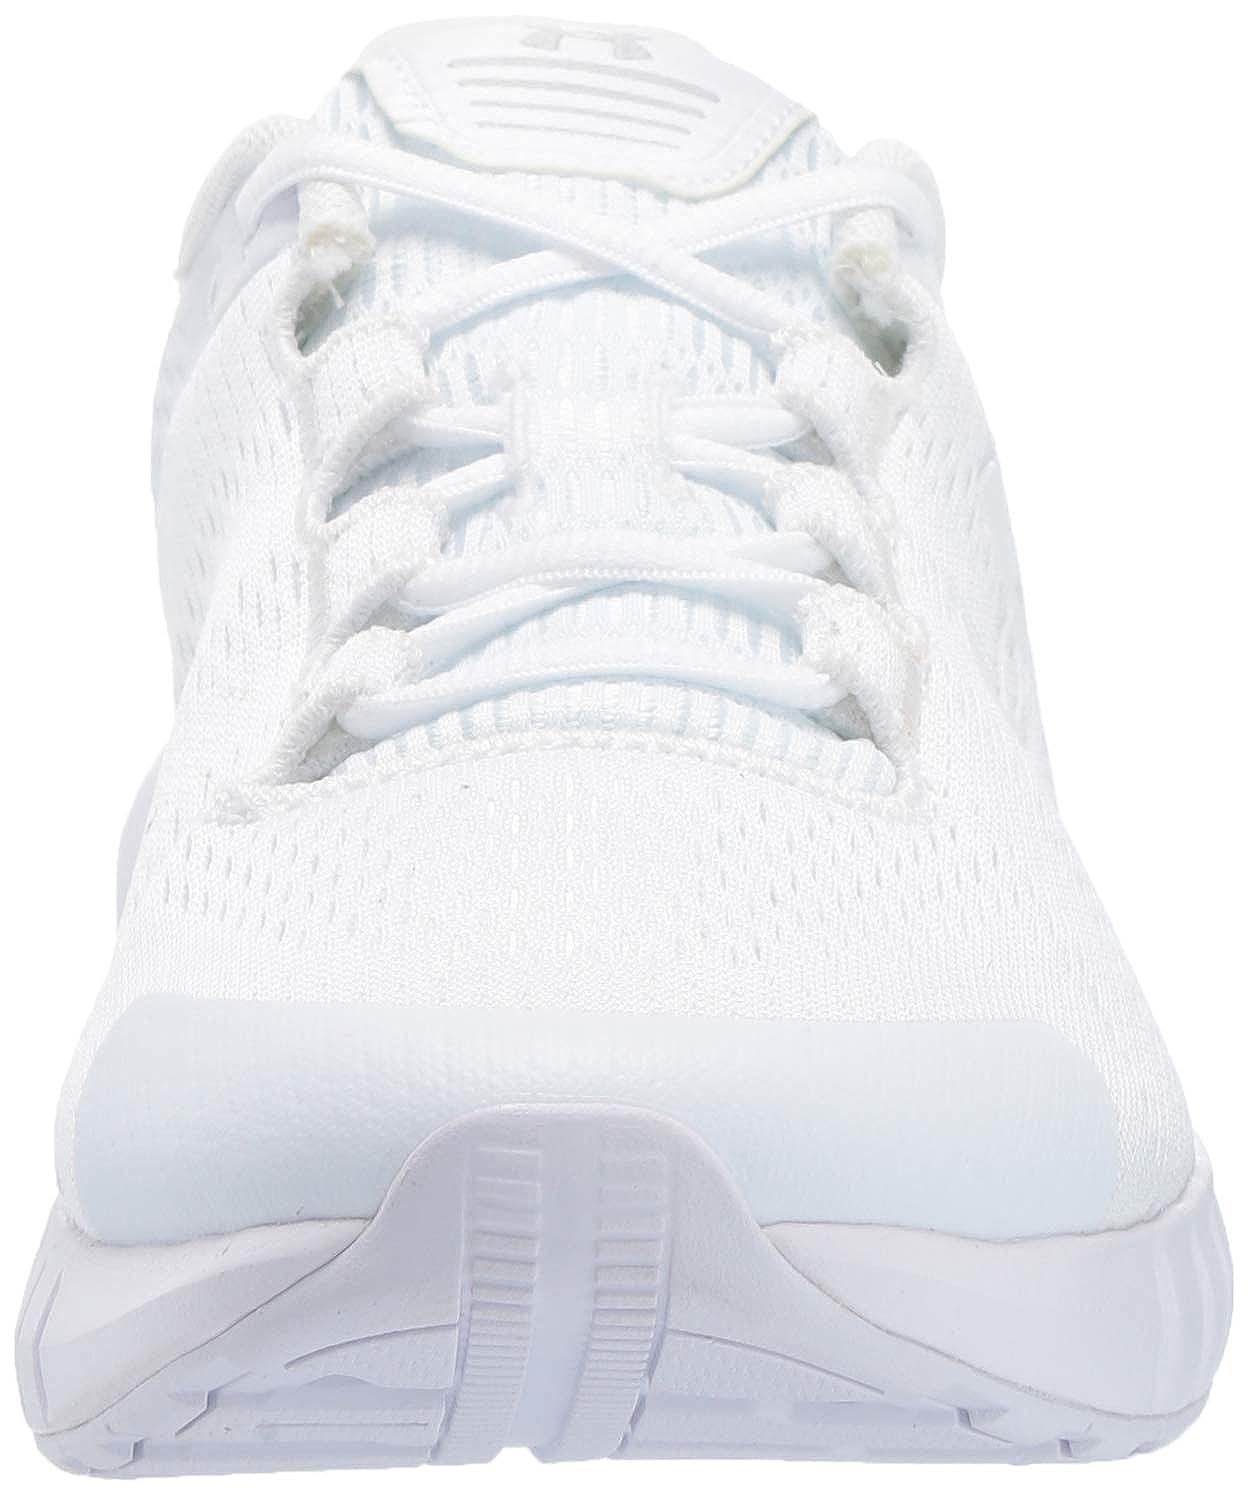 Mimar montón Enlace  Zapatillas de Running para Mujer Under Armour Micro G Pursuit BP Correr en  asfalto